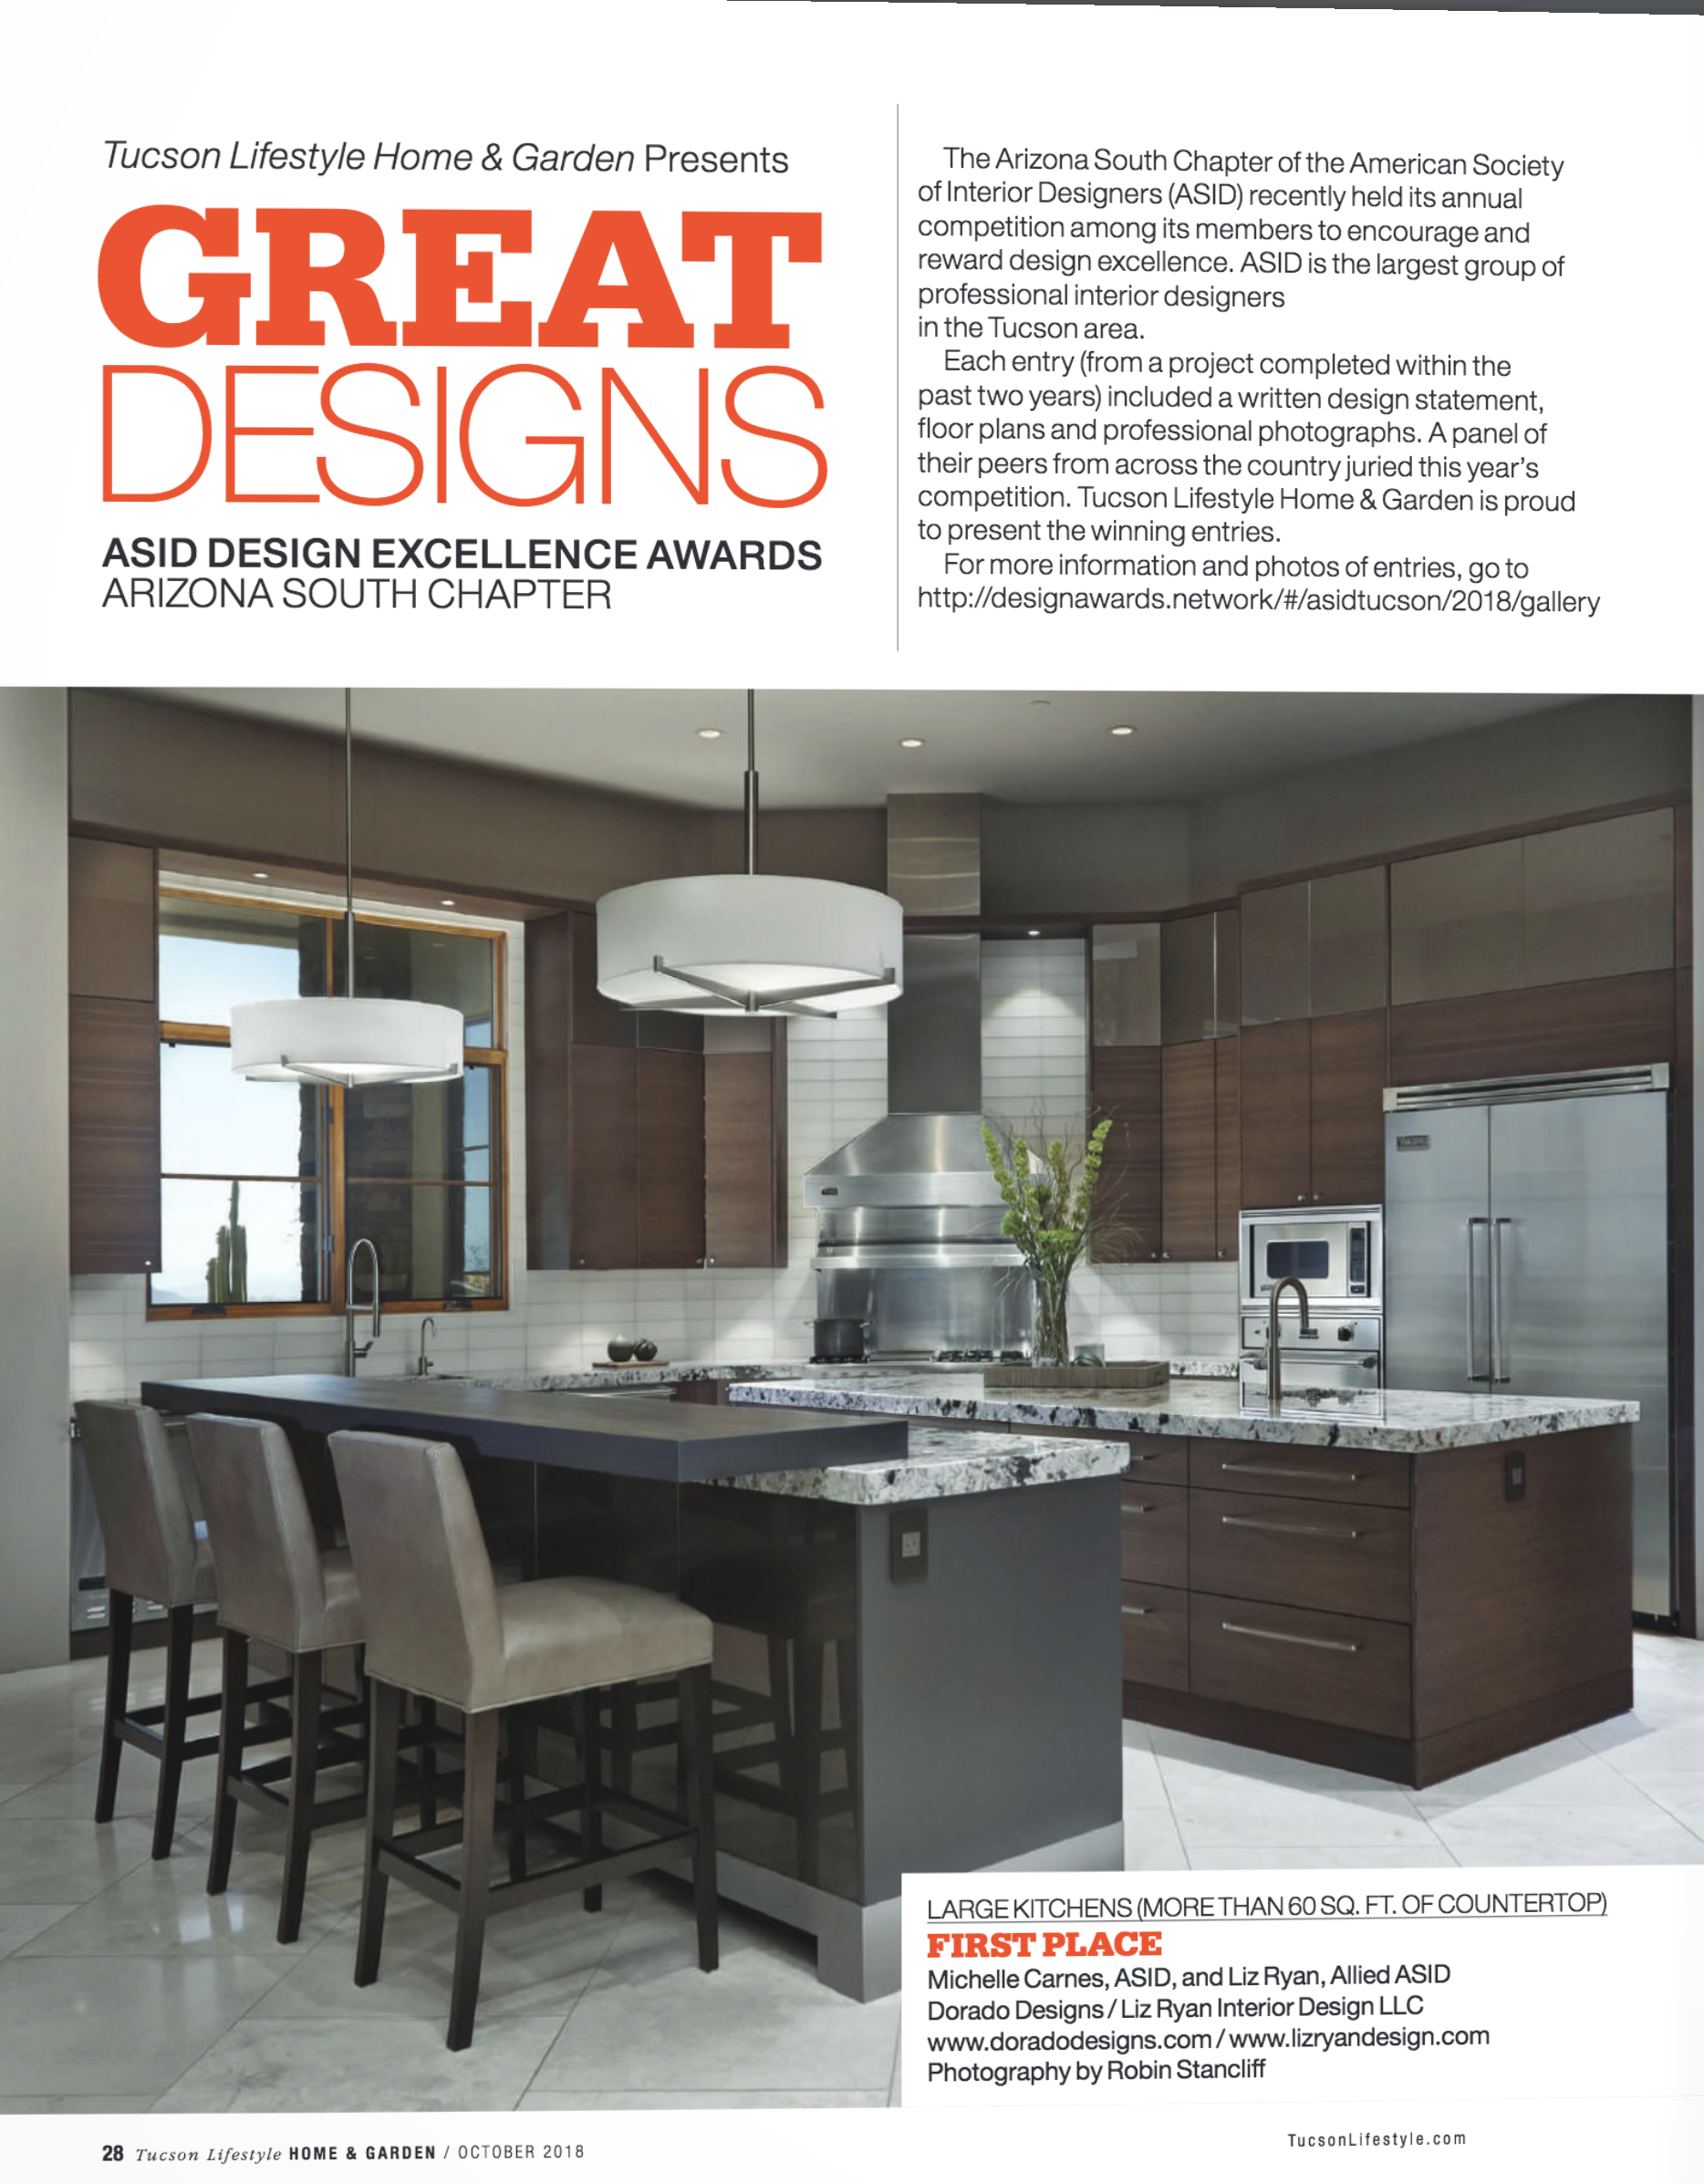 Dorado Designs - Tucson Life Style Home & Garden Awards Magazine 2018